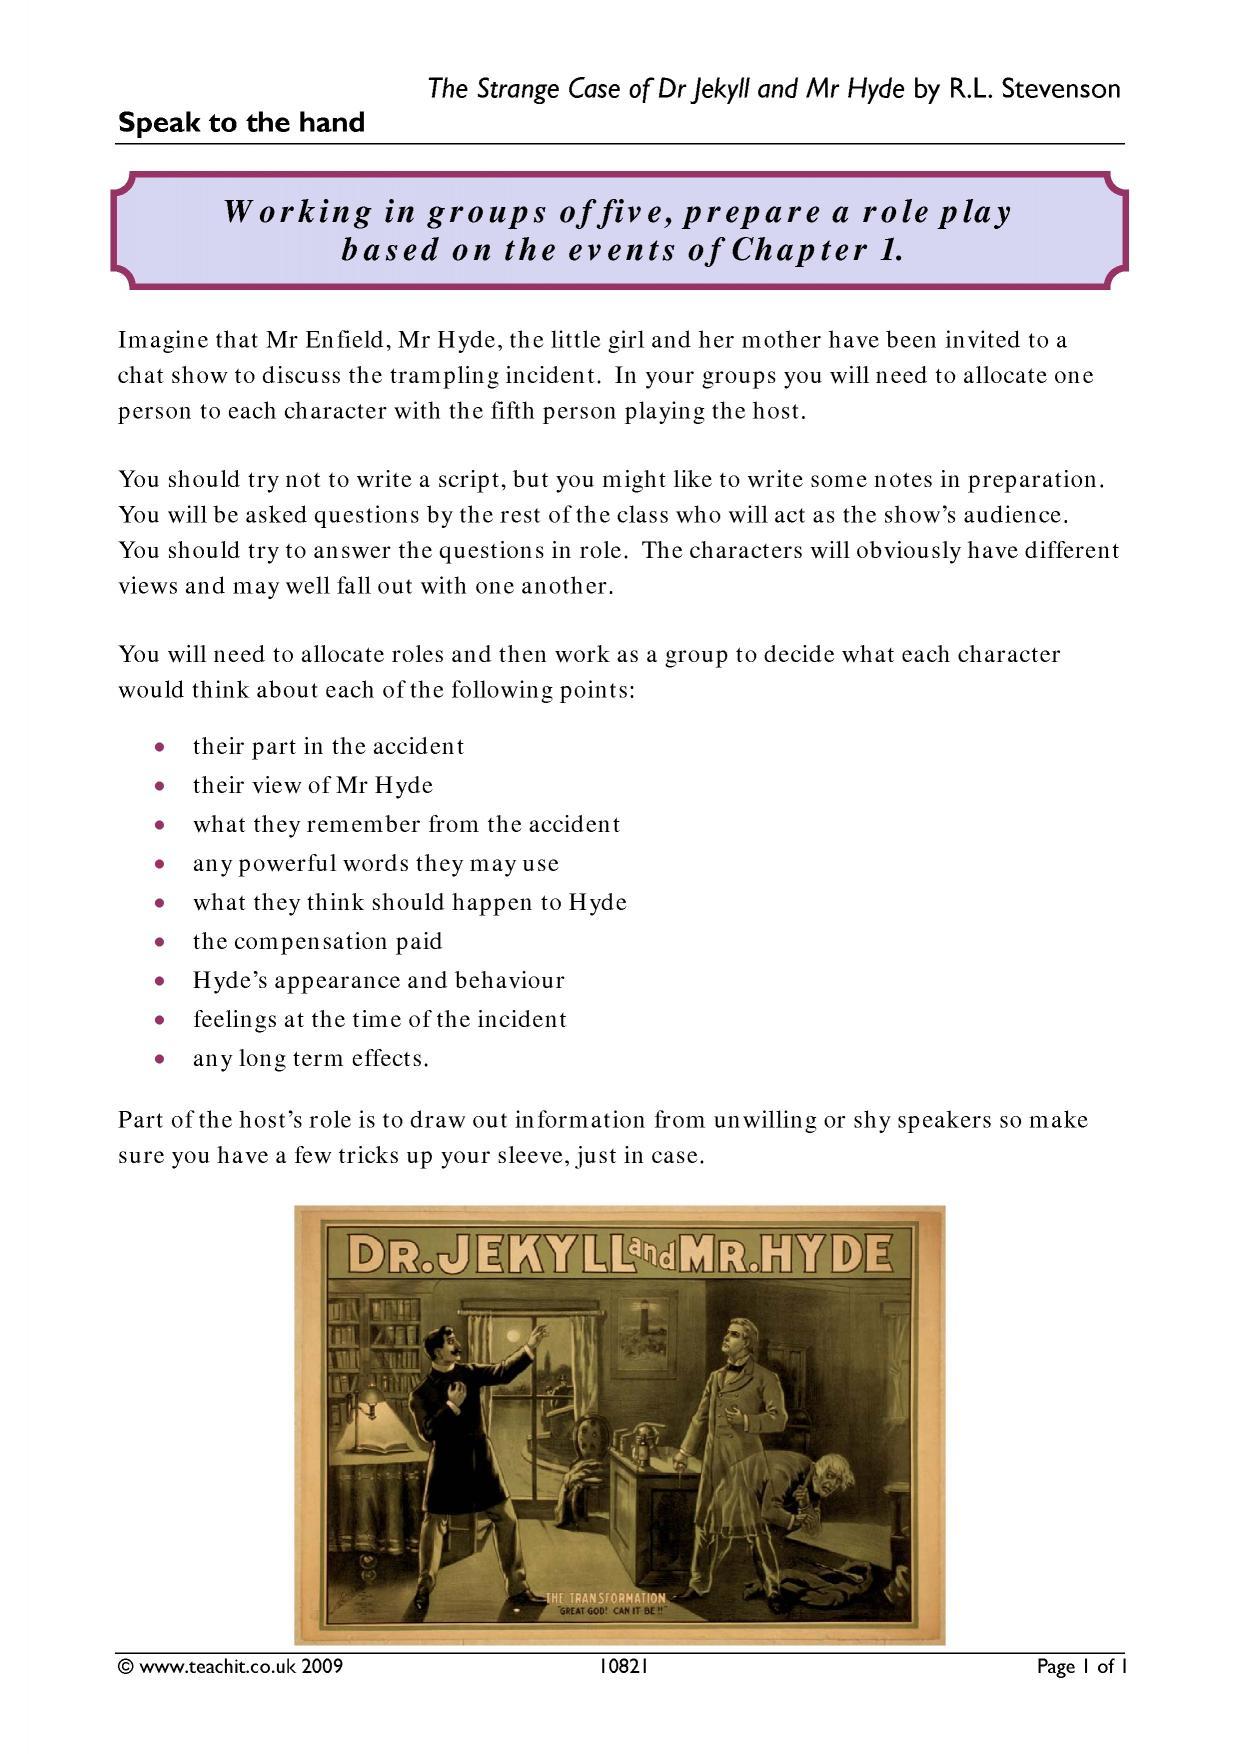 Dr Jekyll And Mr Hyde The Strange Case Of By Robert Louis Stevenson